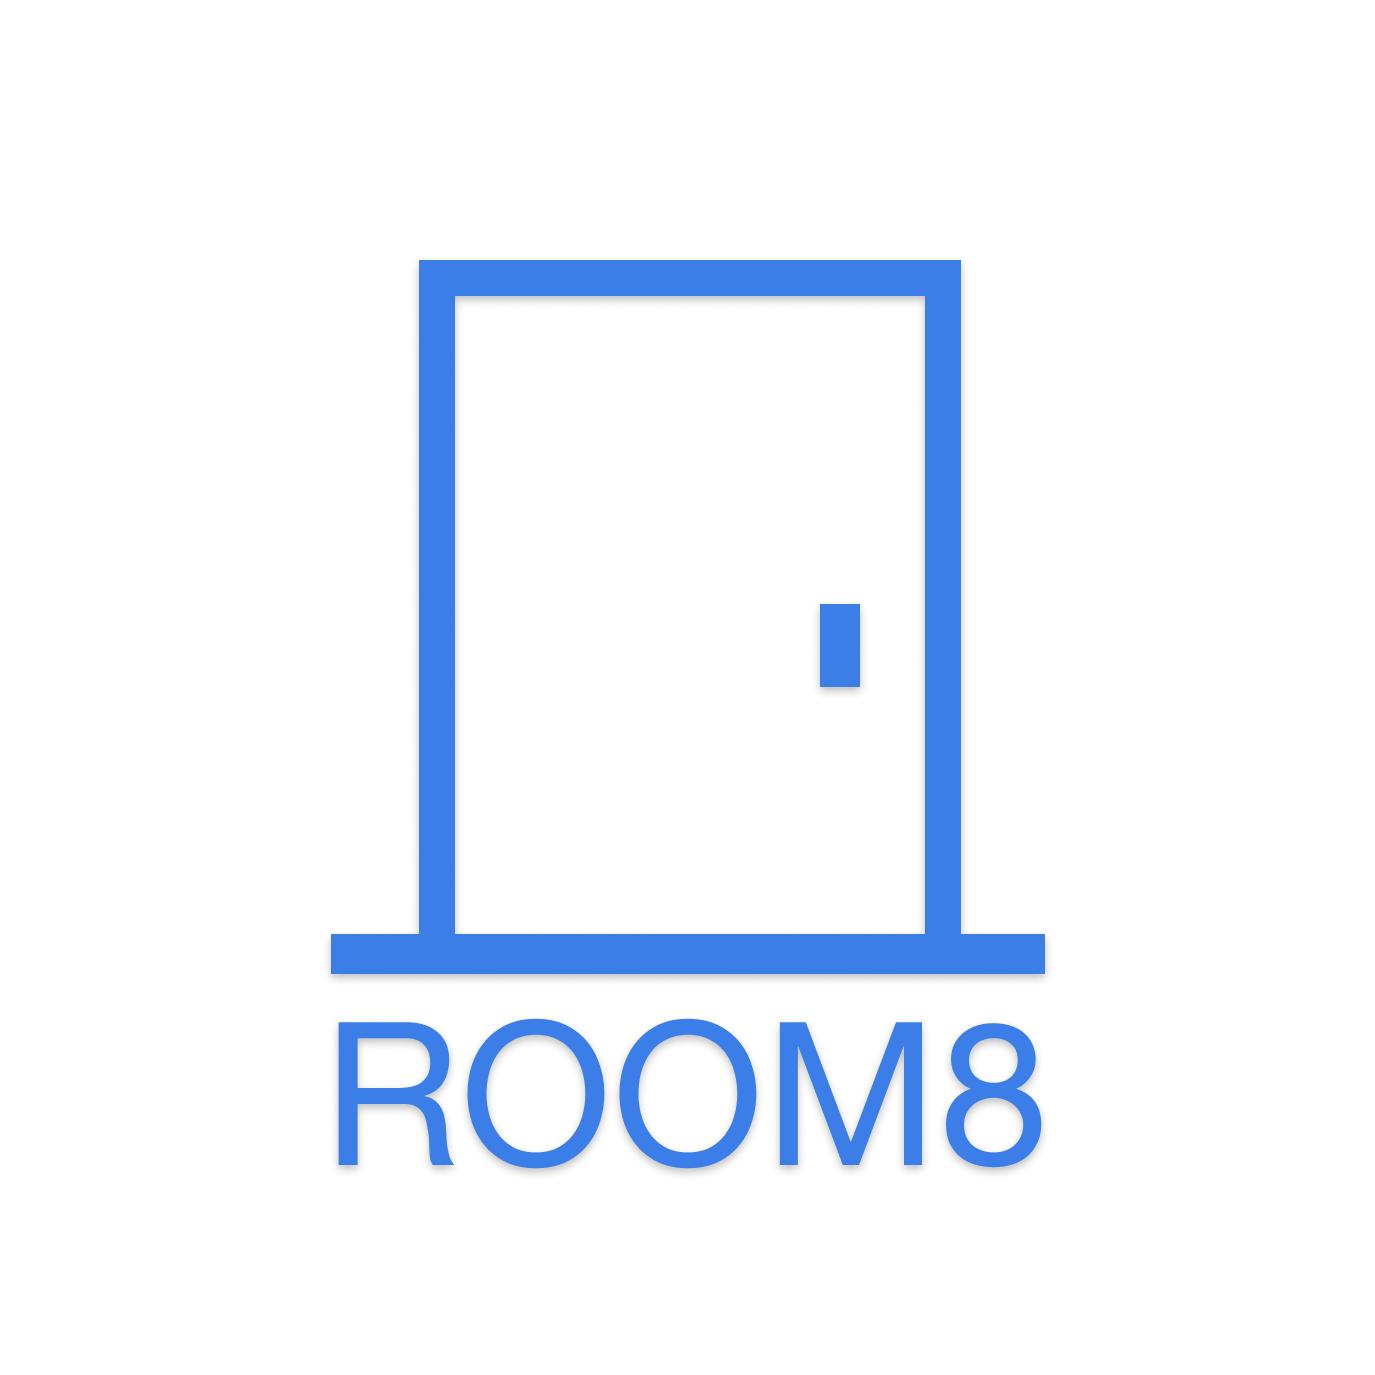 ROOM8_onwhite